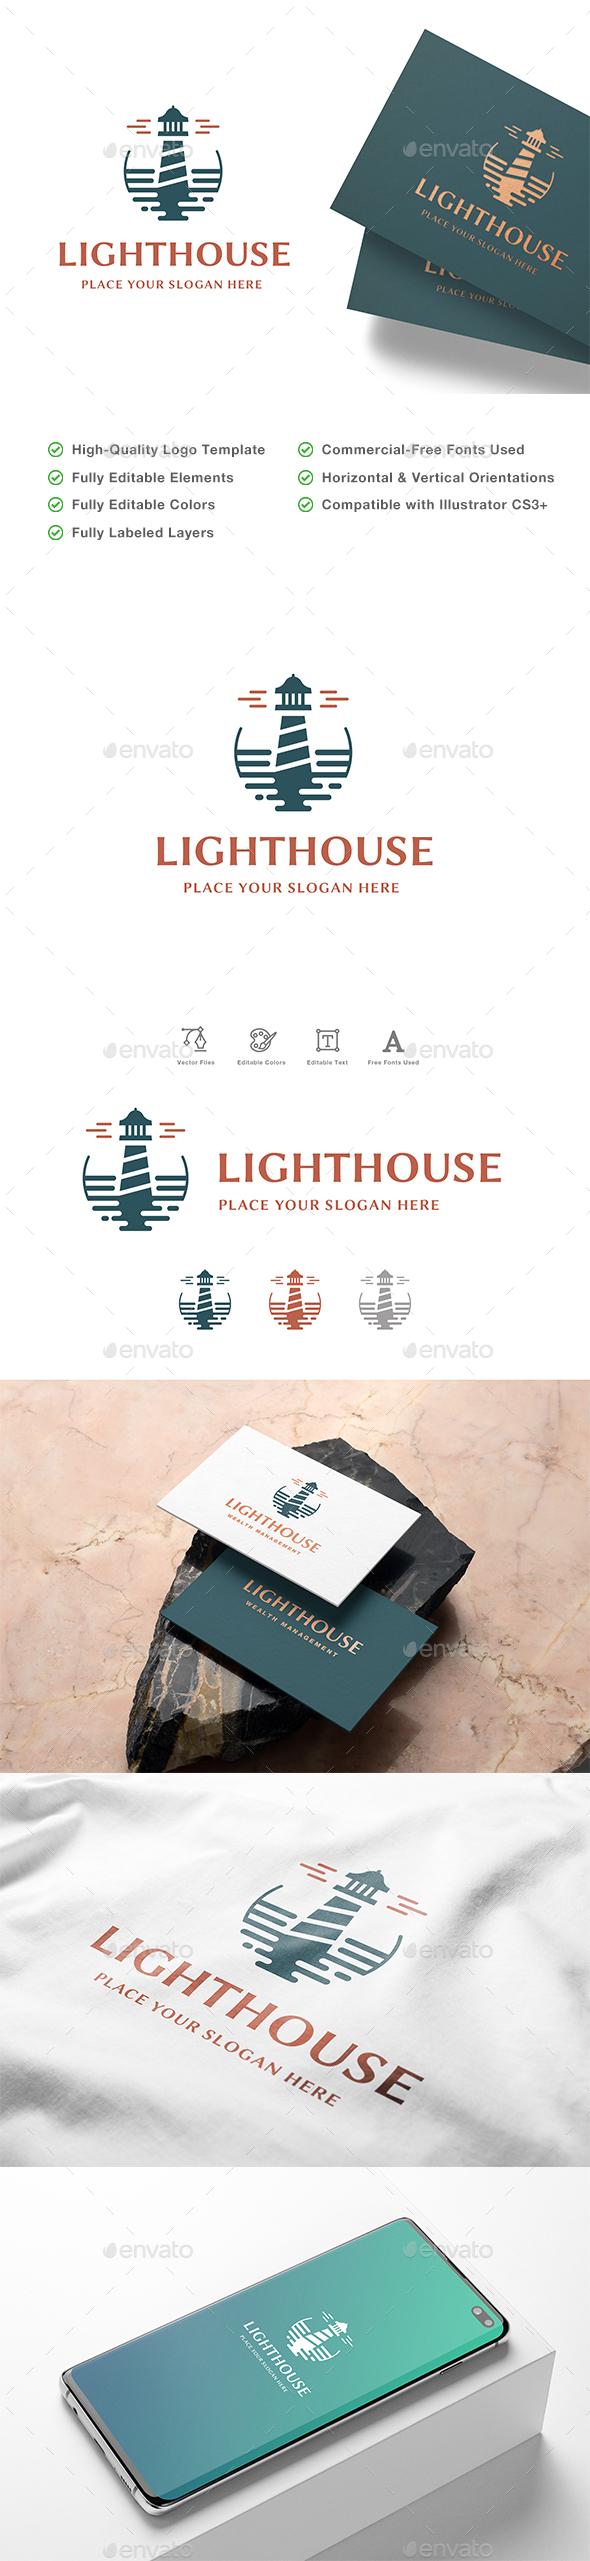 Modern Lighthouse Logo